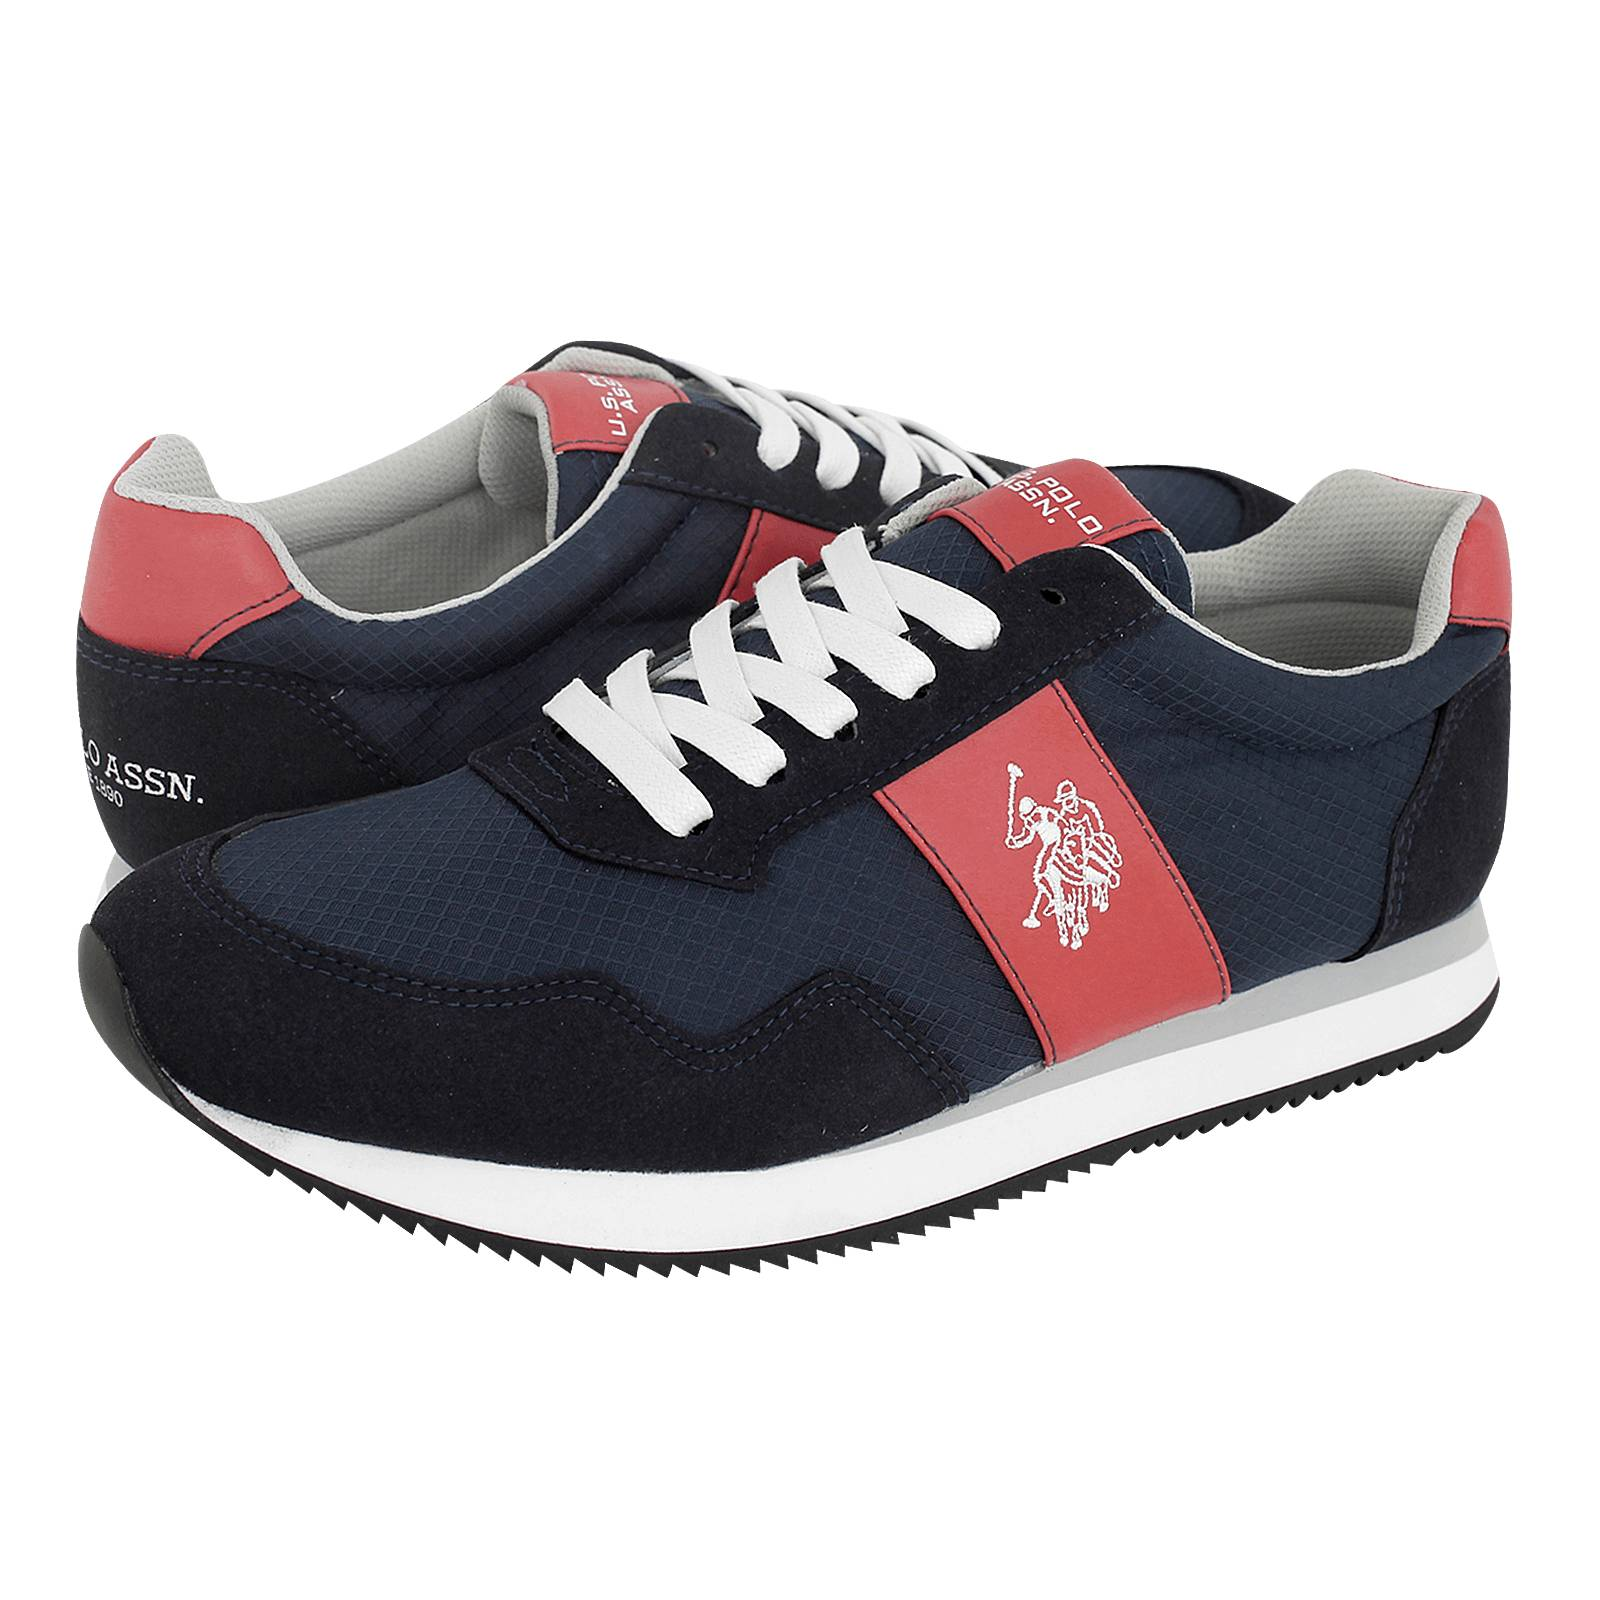 Cambil - Ανδρικά παπούτσια casual U.S. Polo ASSN από ύφασμα και ... b09b8adbf0e